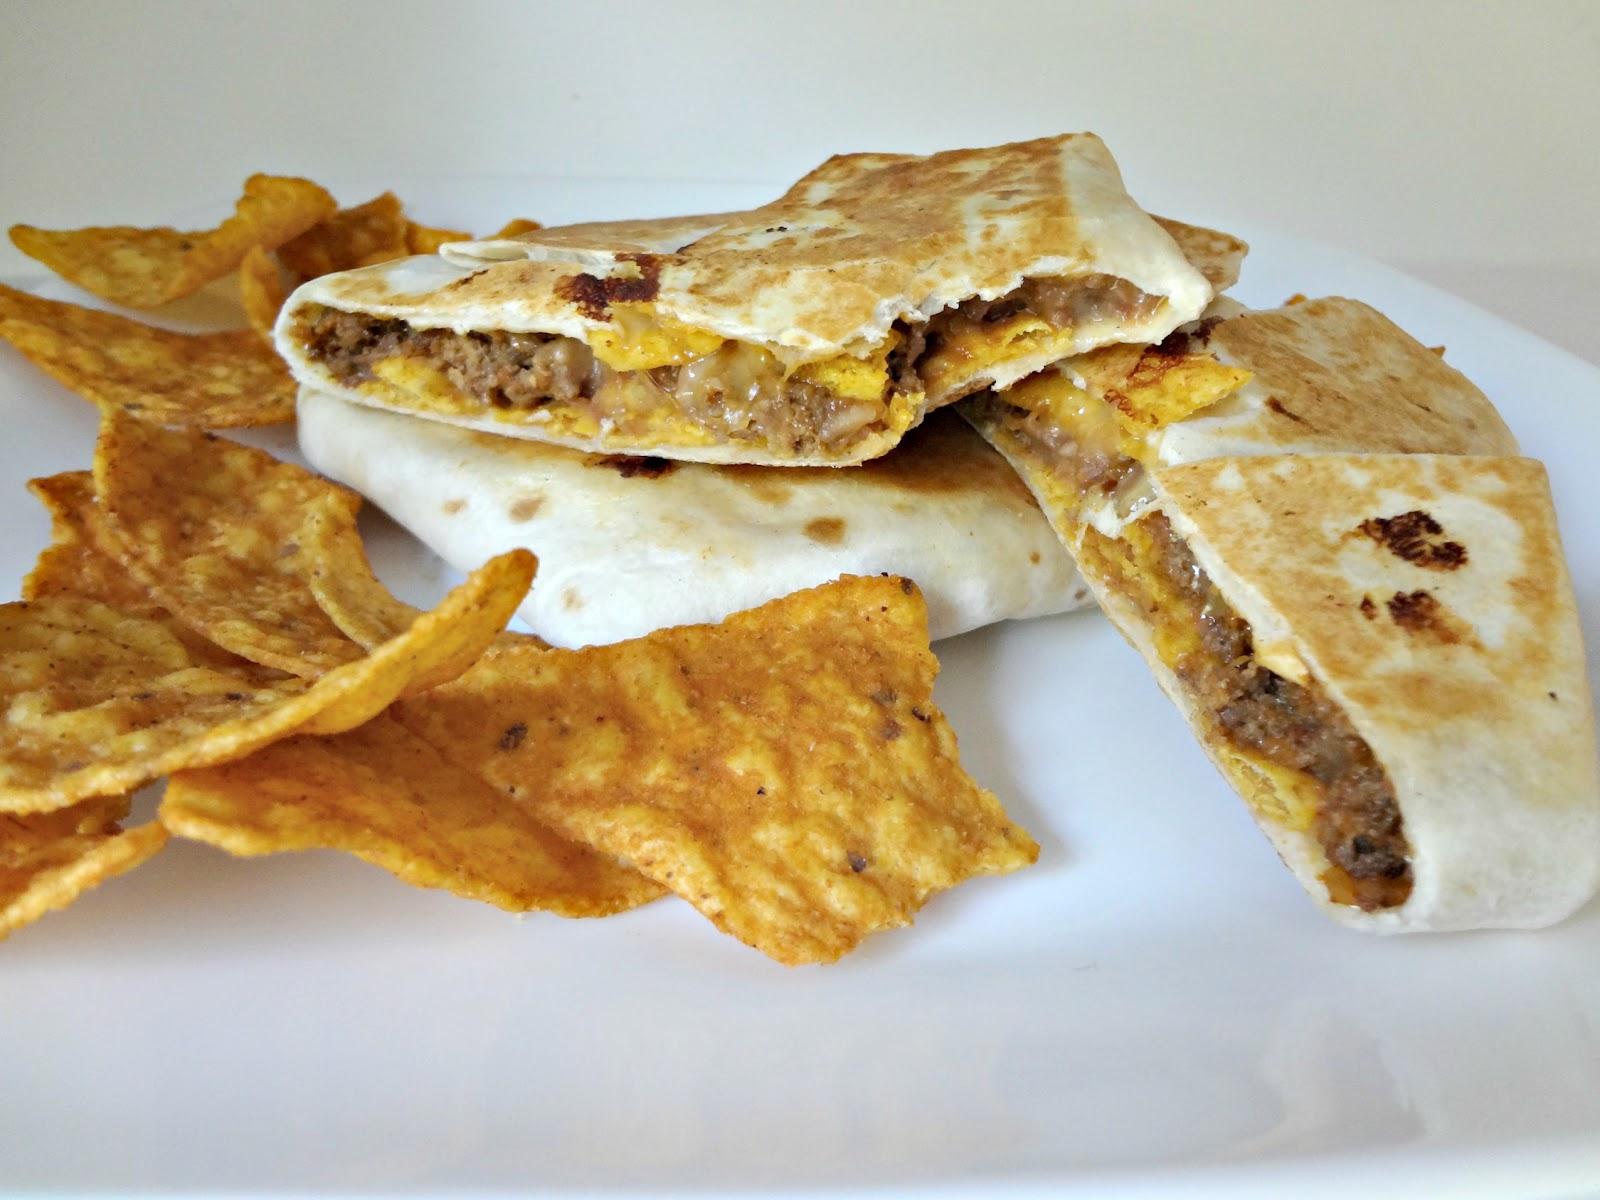 fast food versus homemade food